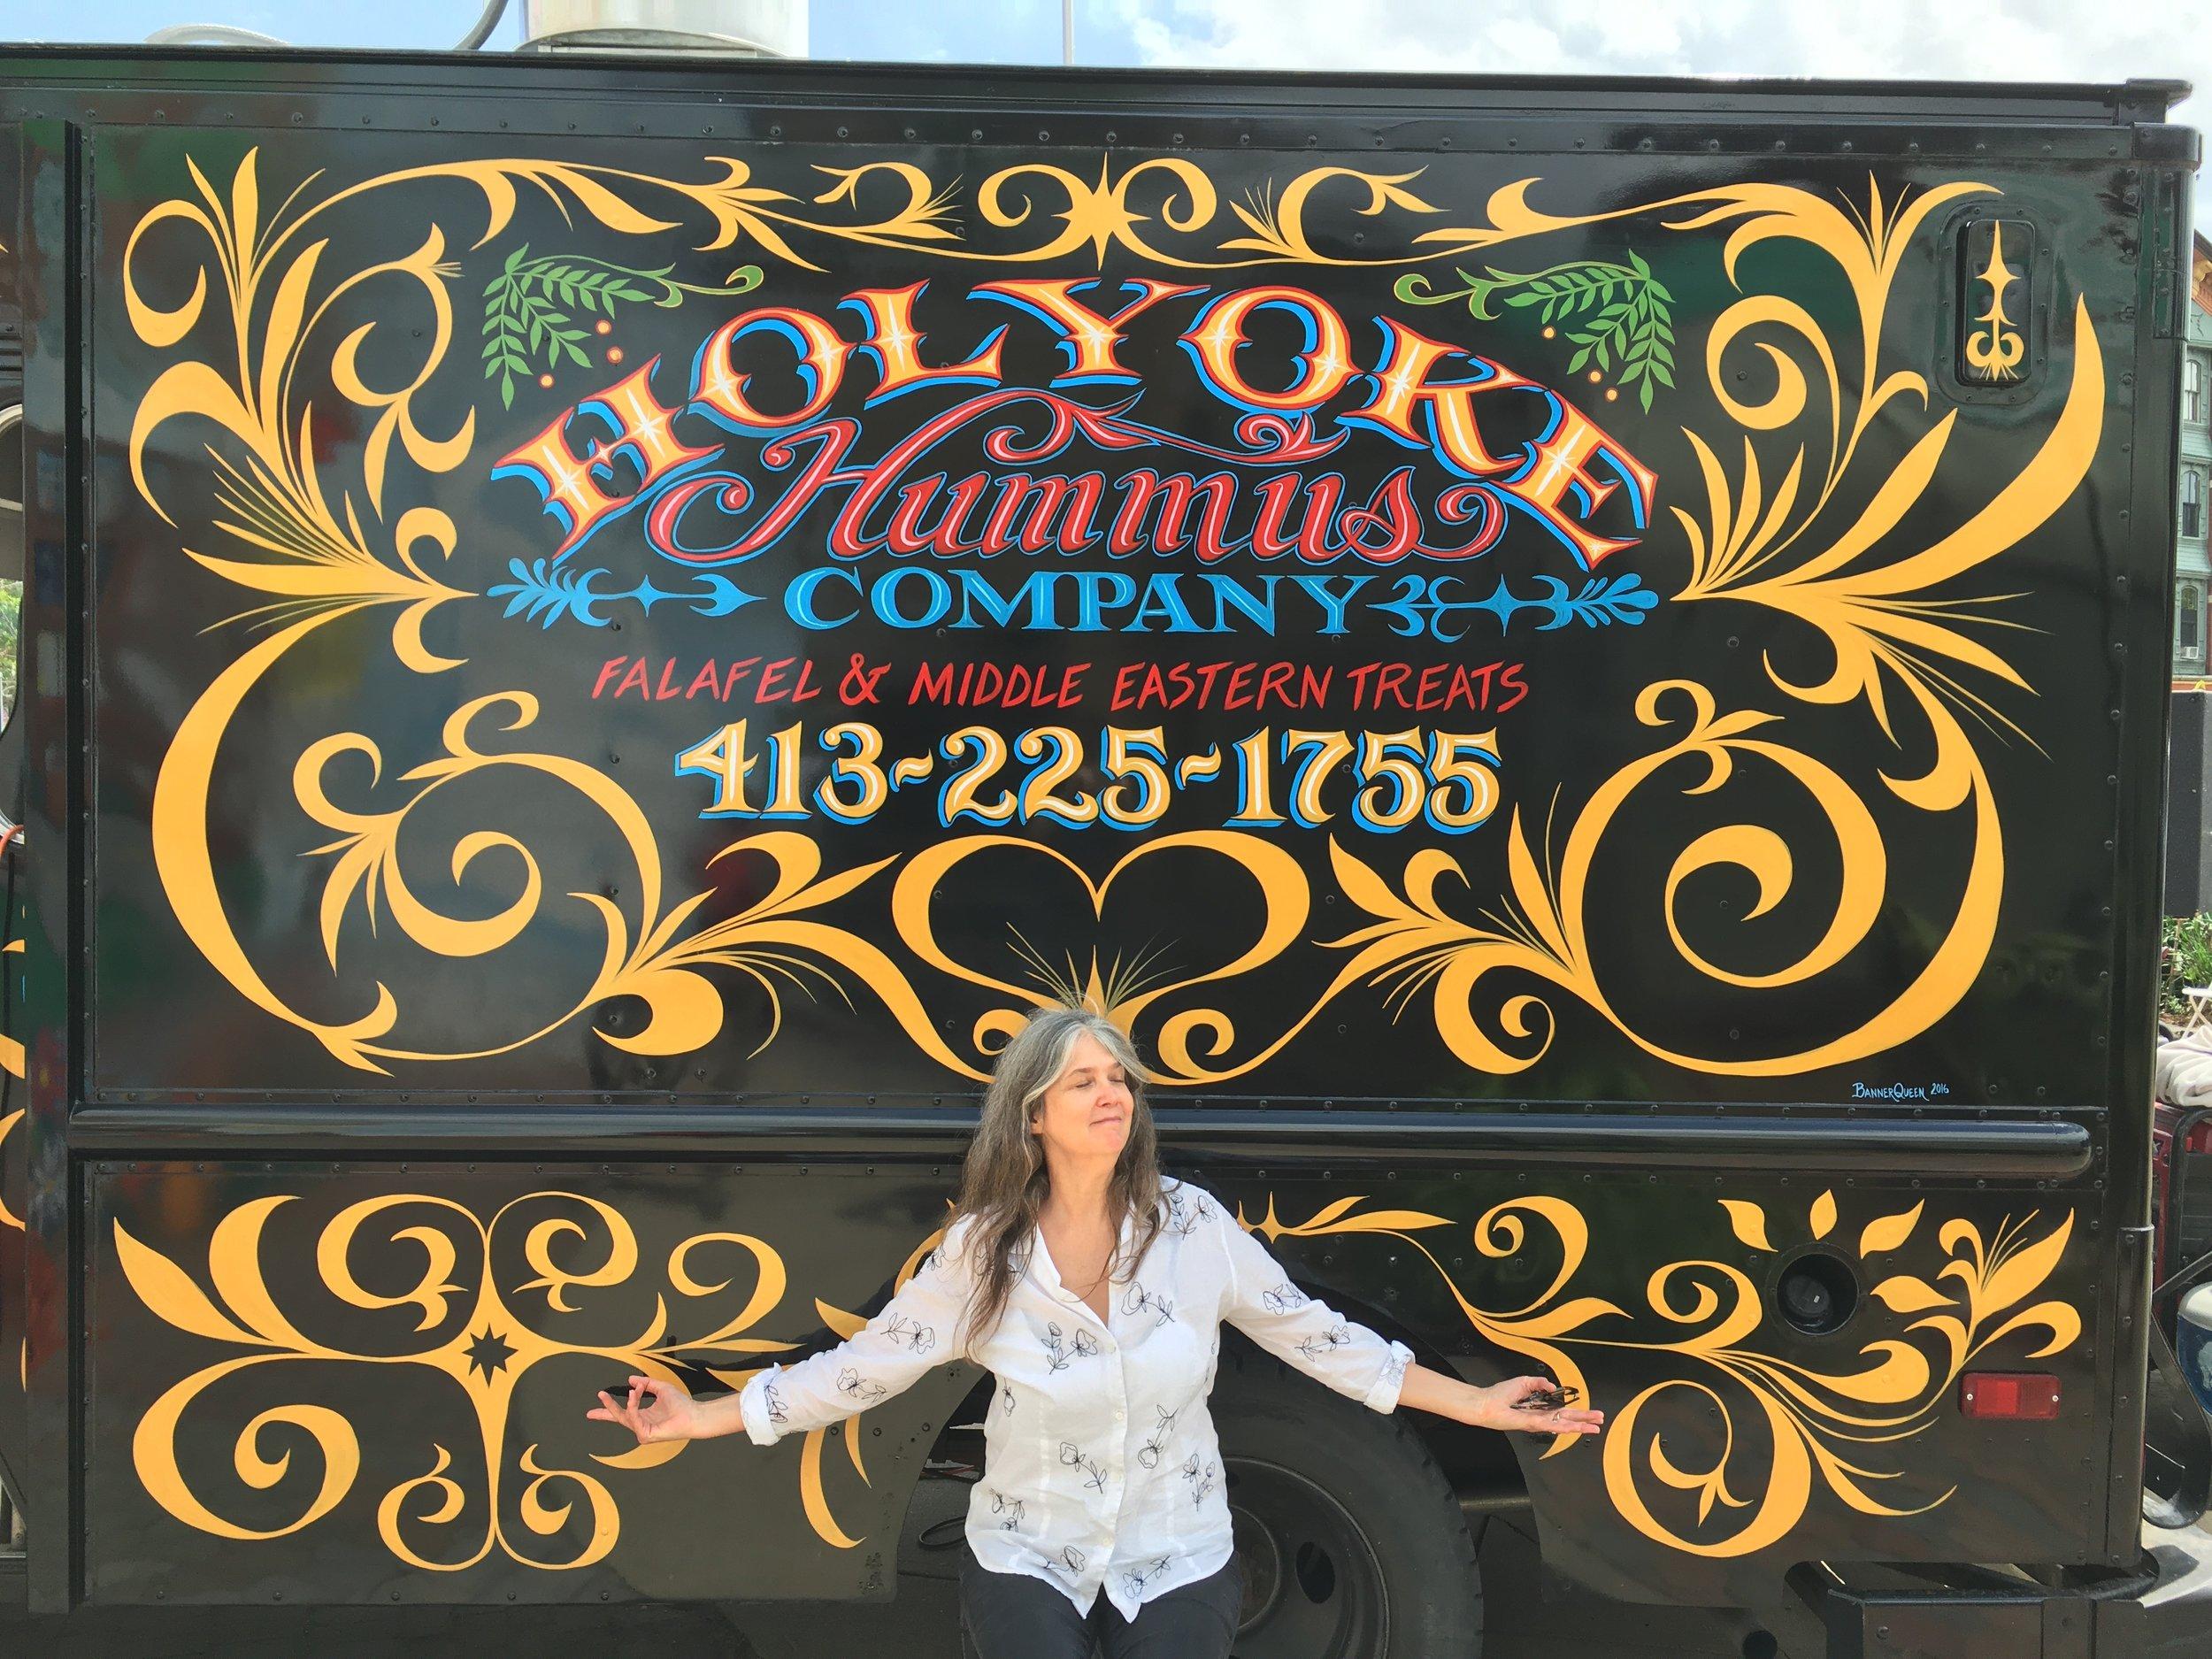 Holyoke Hummus Food Truck